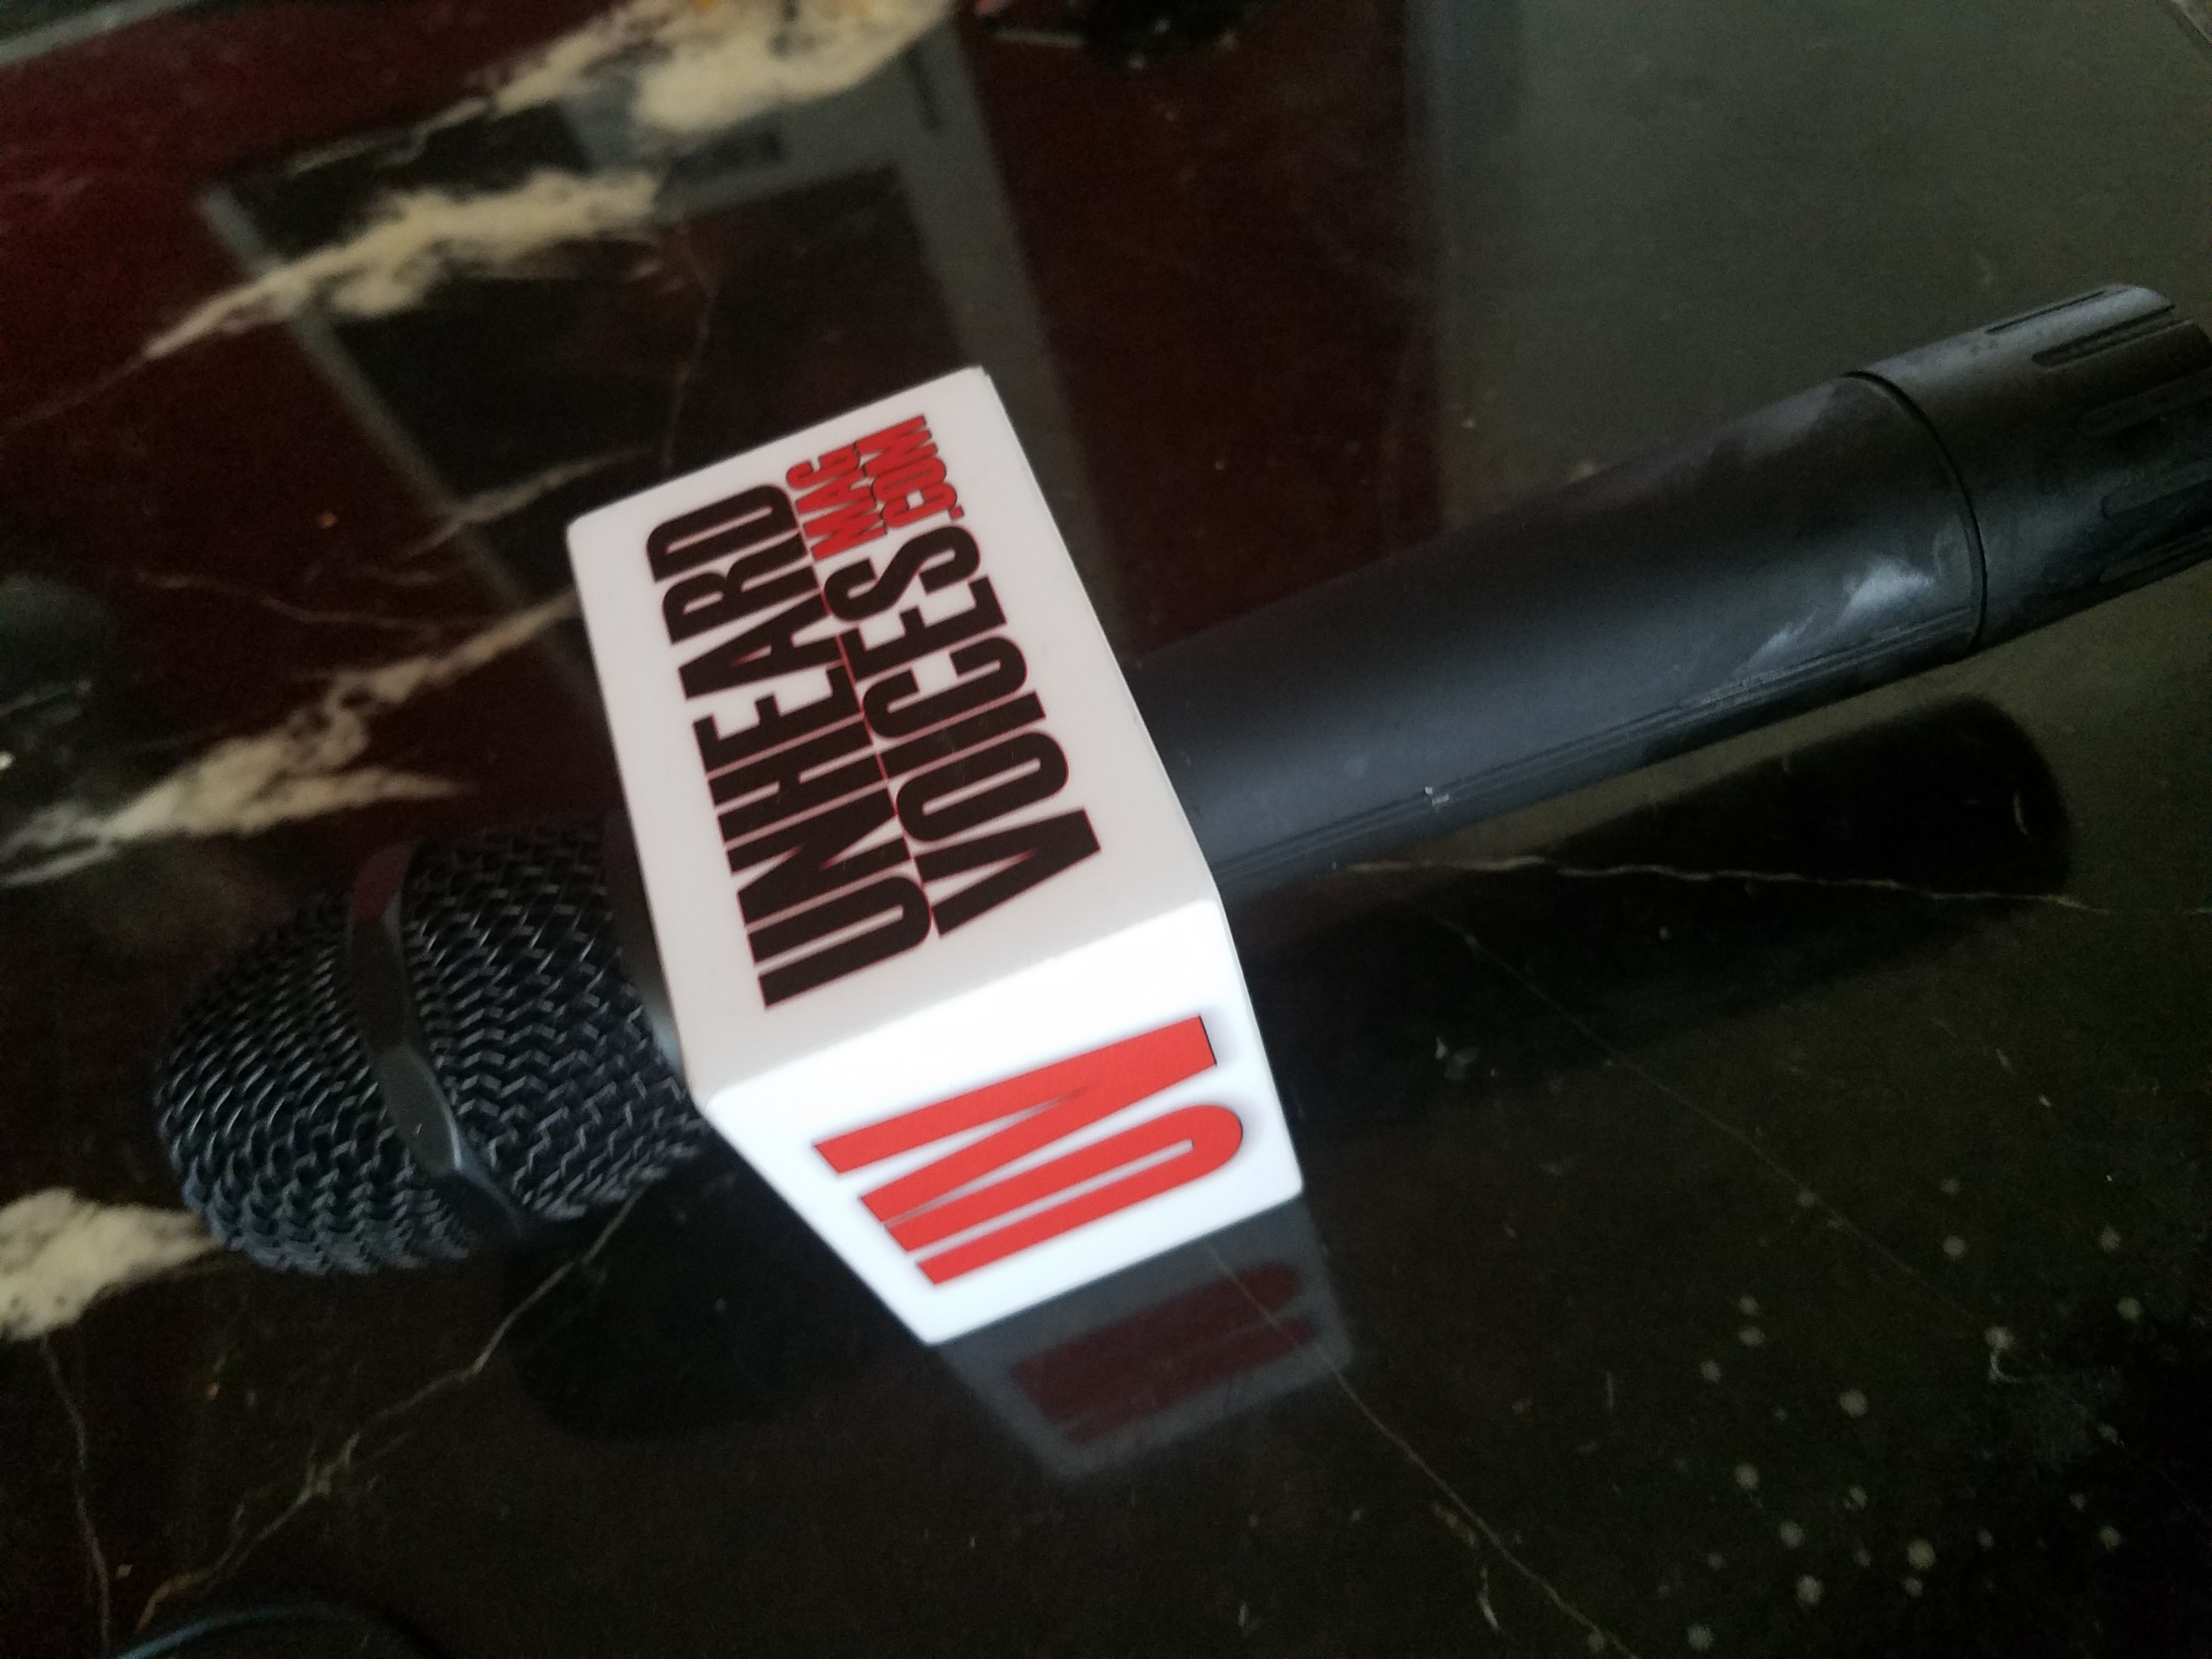 Unheard Voices Microphone